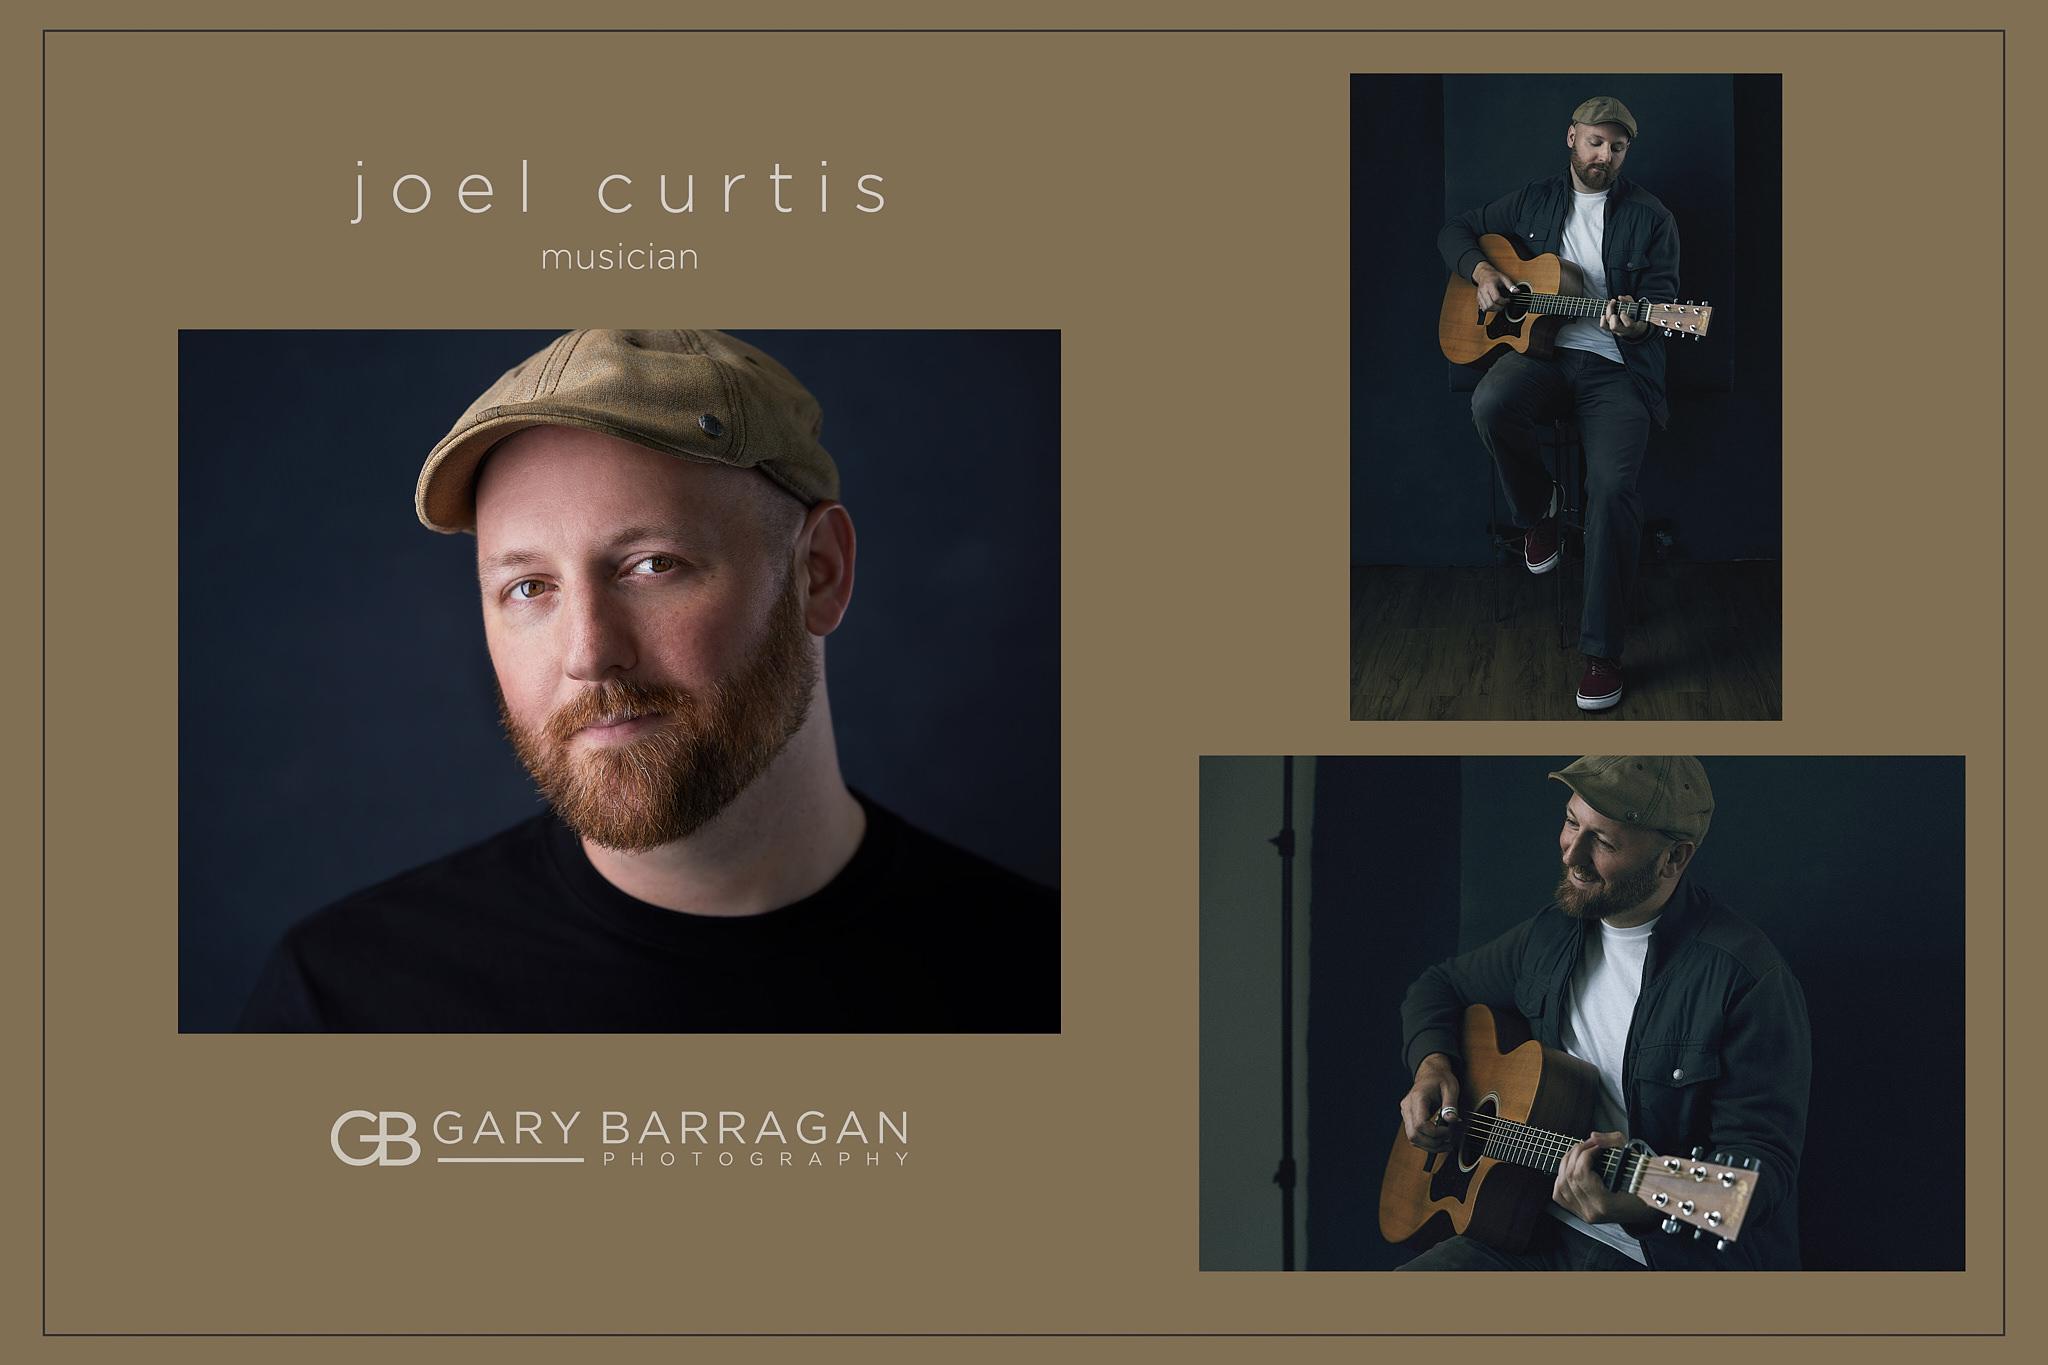 Joel Curtis Musician